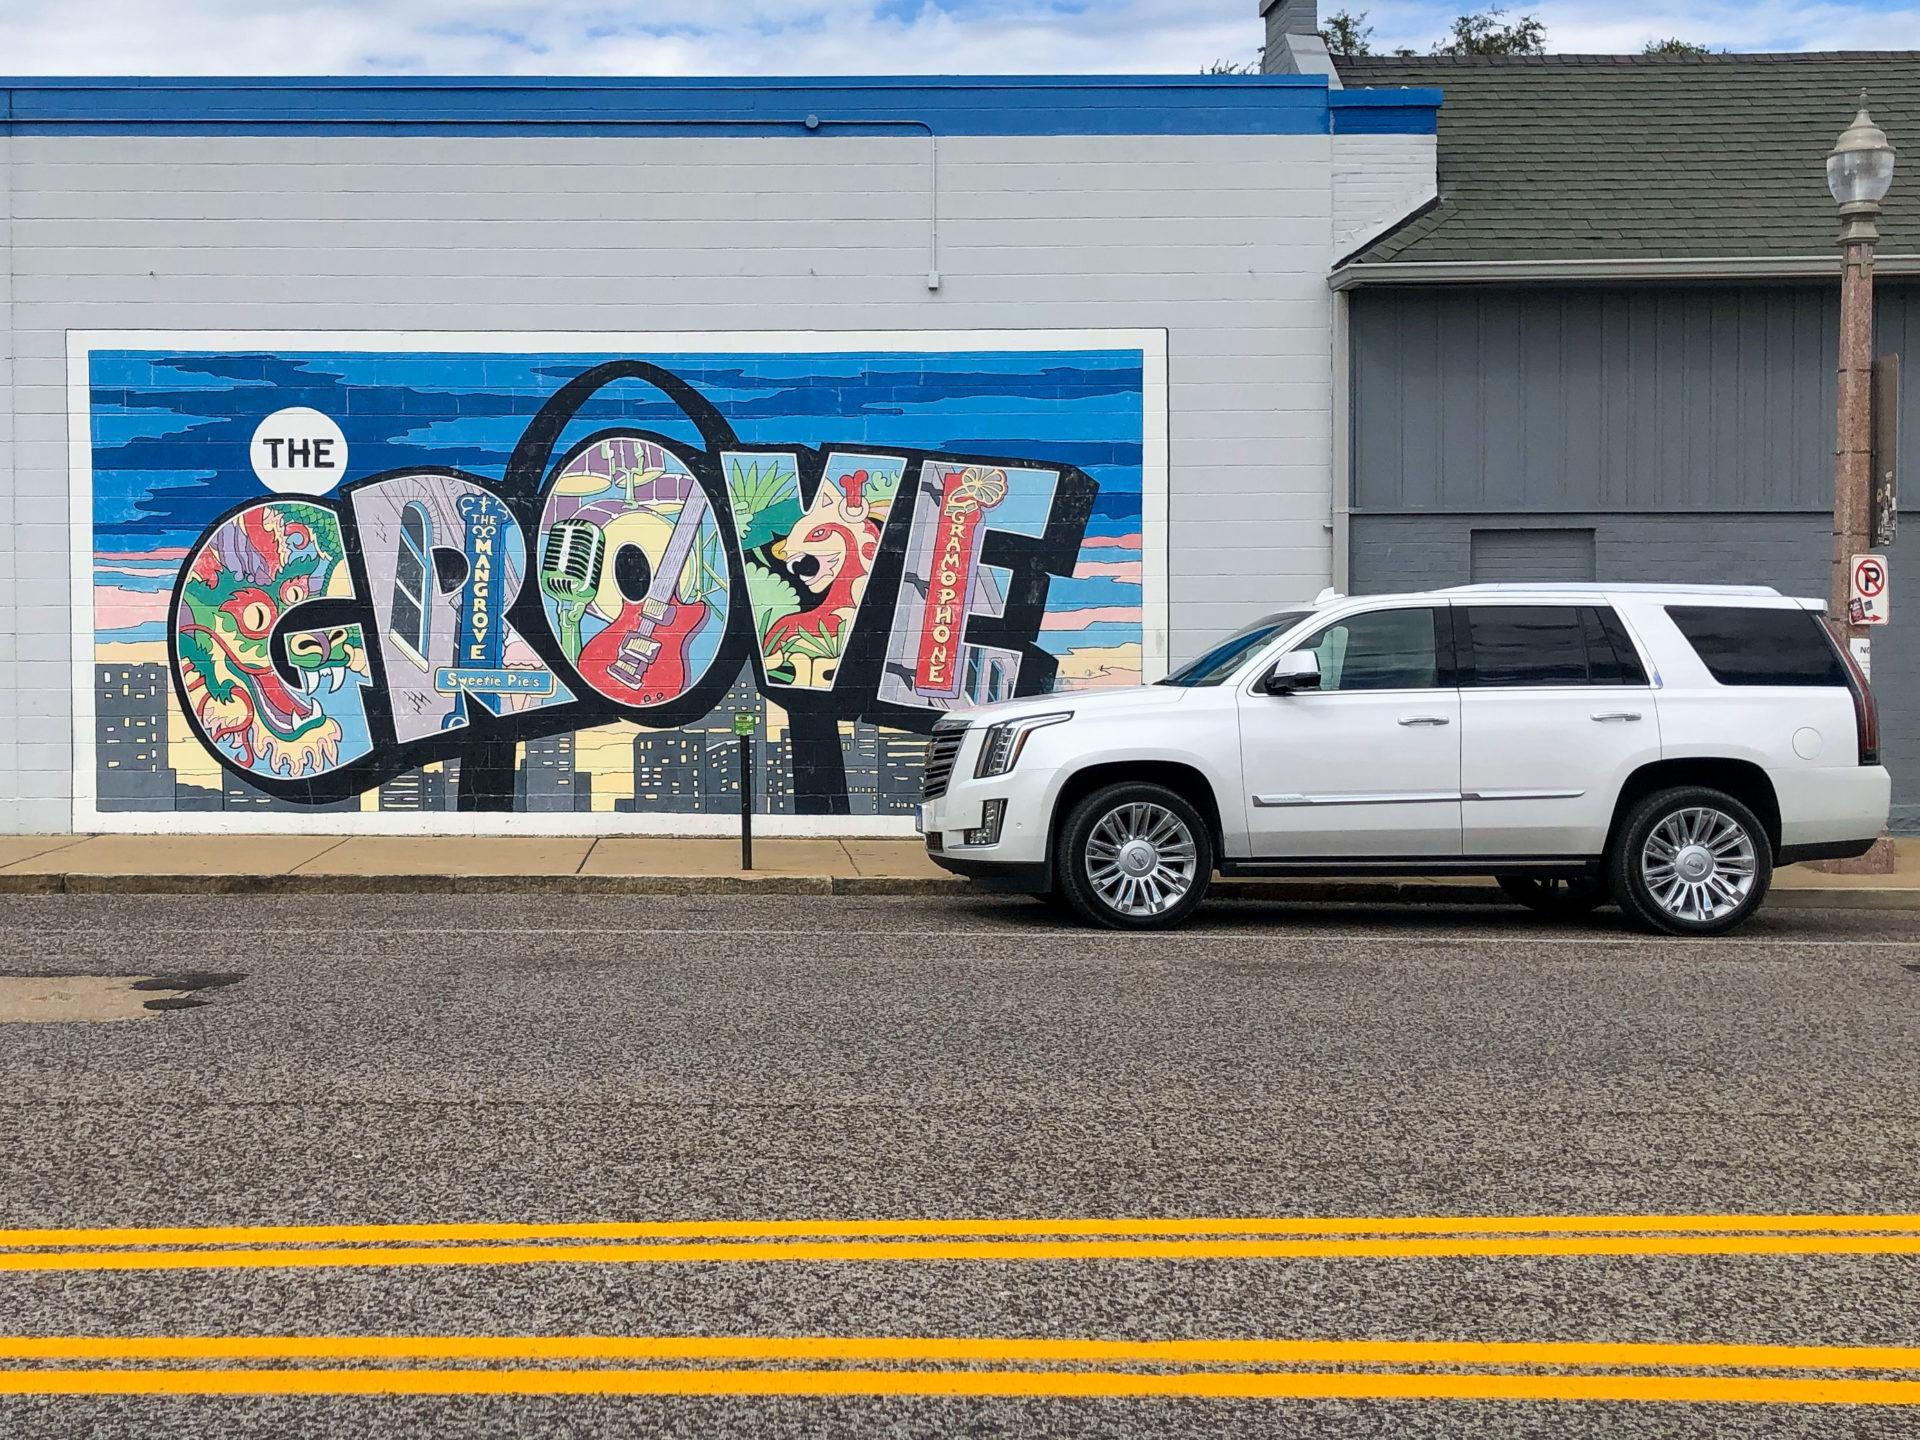 Wandgemälde im Stadtteil The Grove in Saint Louis